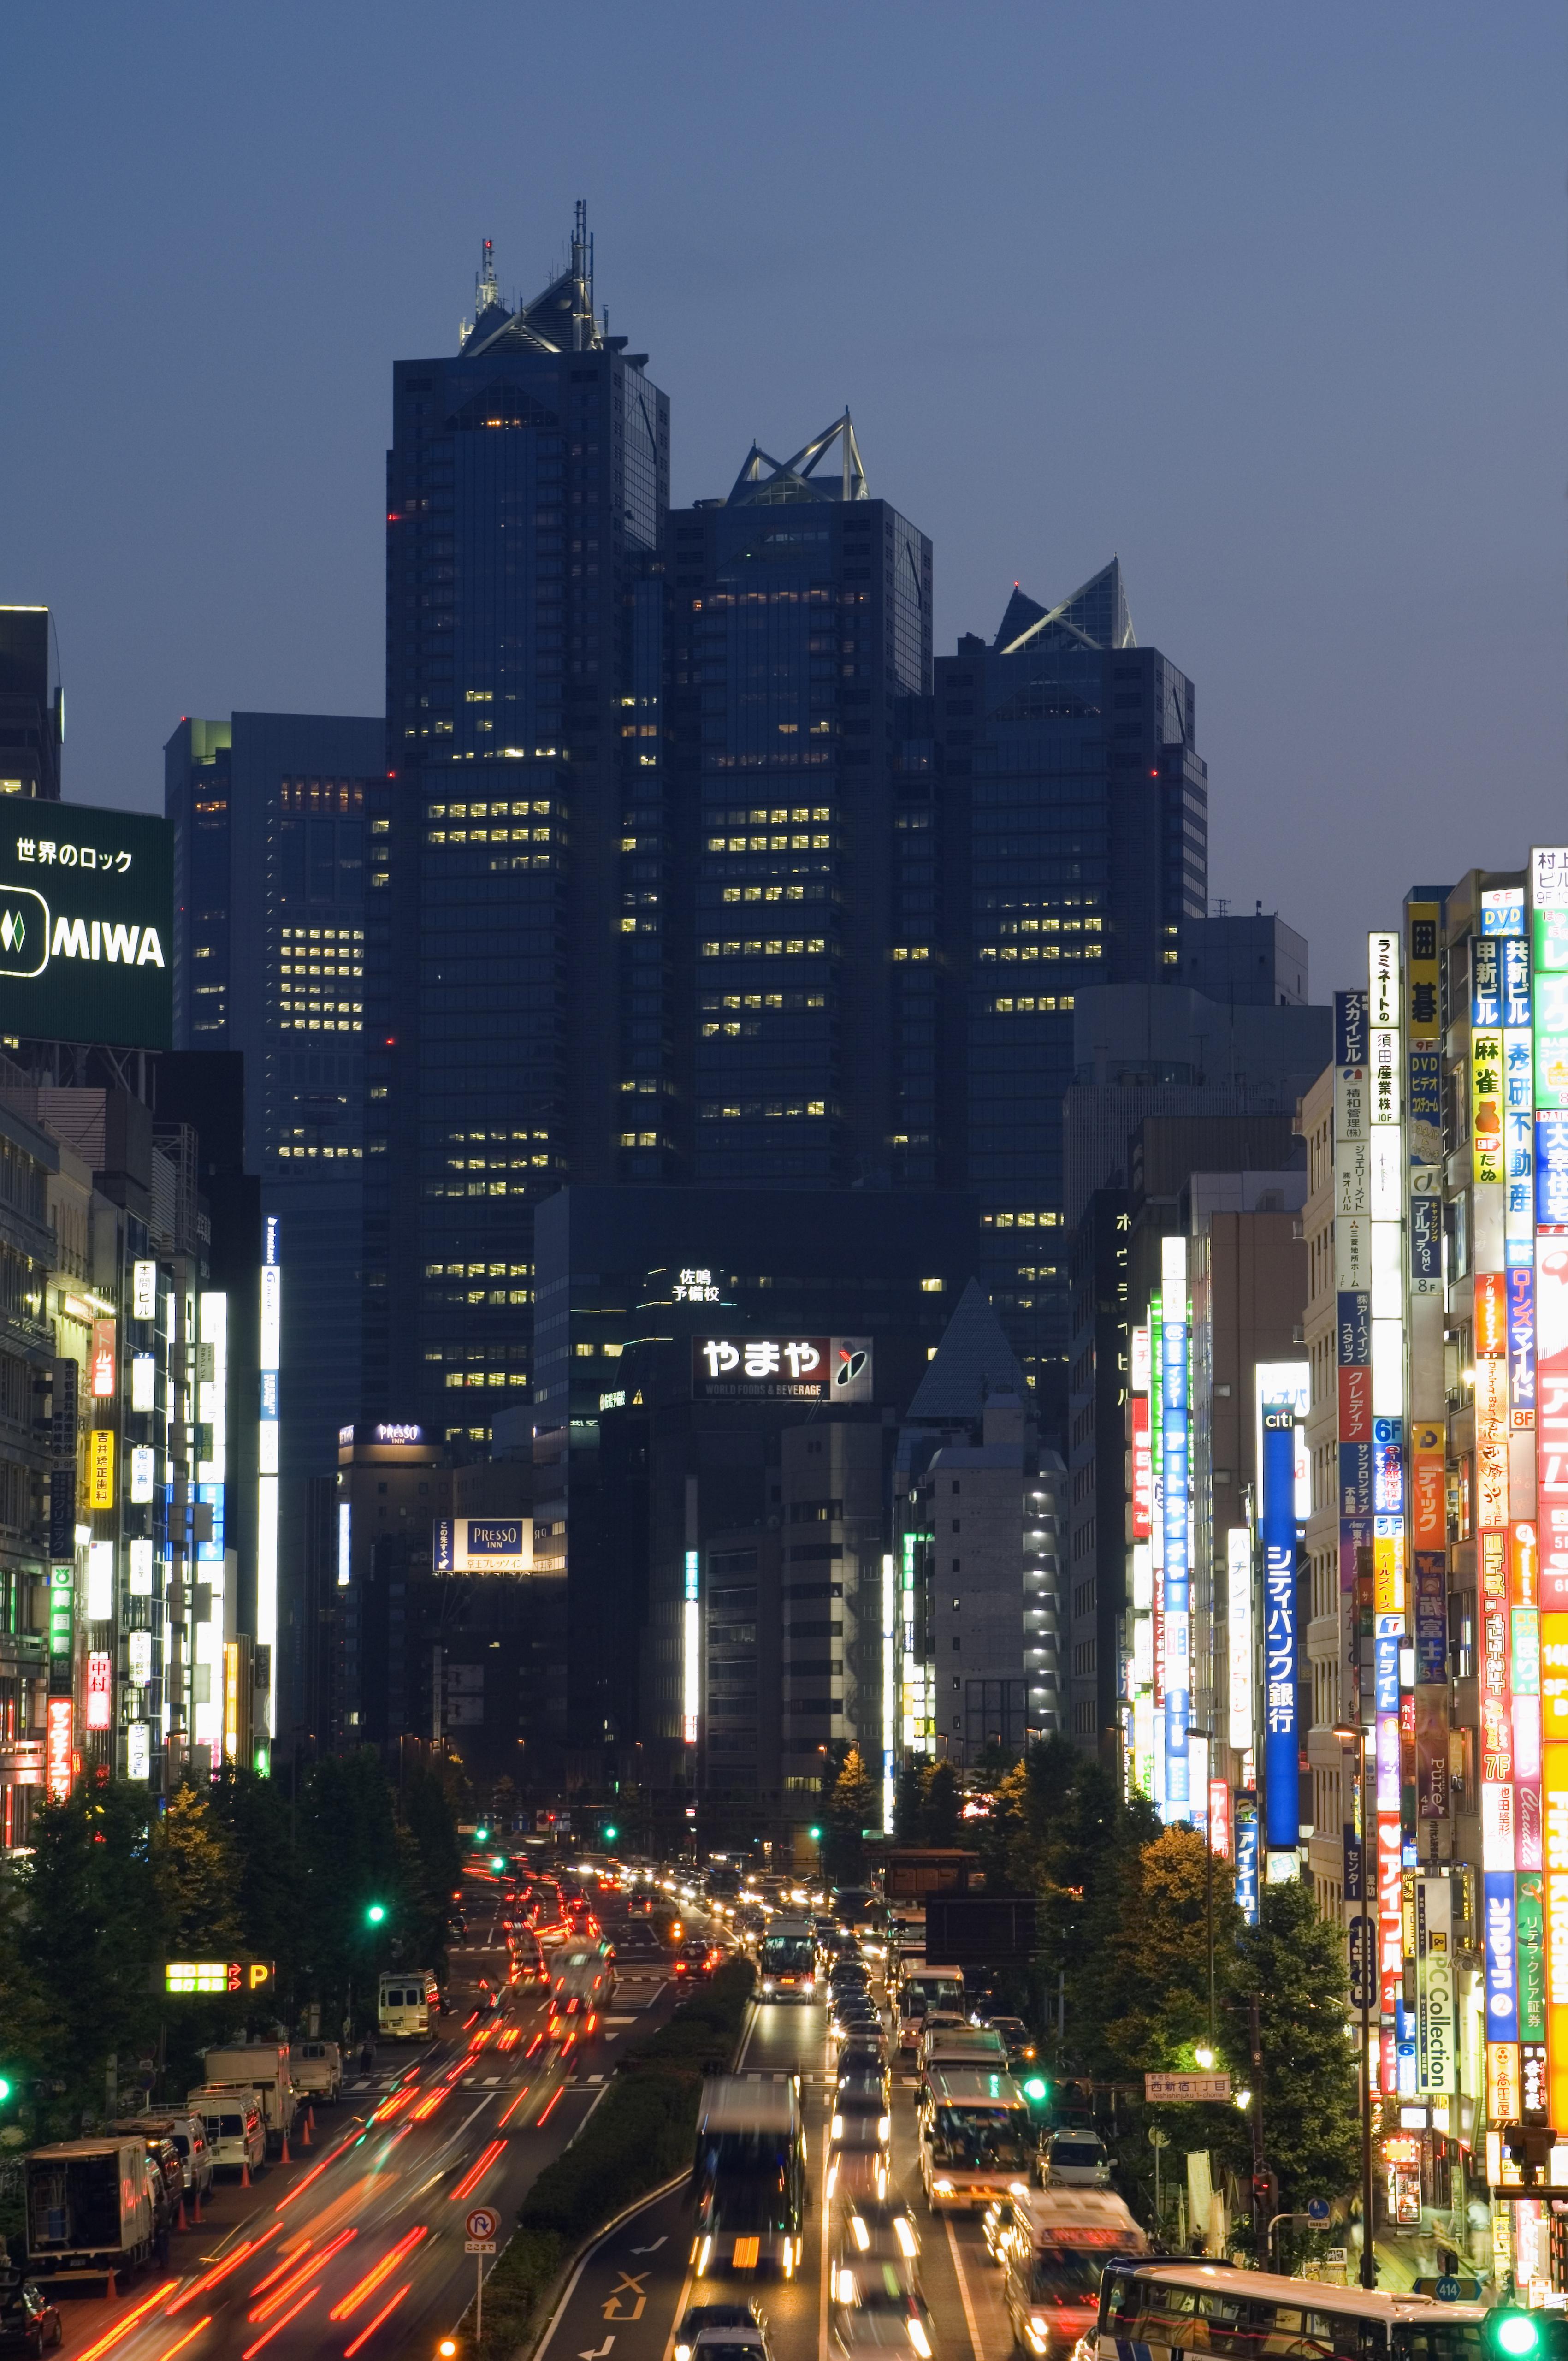 The Park Hyatt Hotel, location of the film Lost in Translation, in Tokyo, Japan.